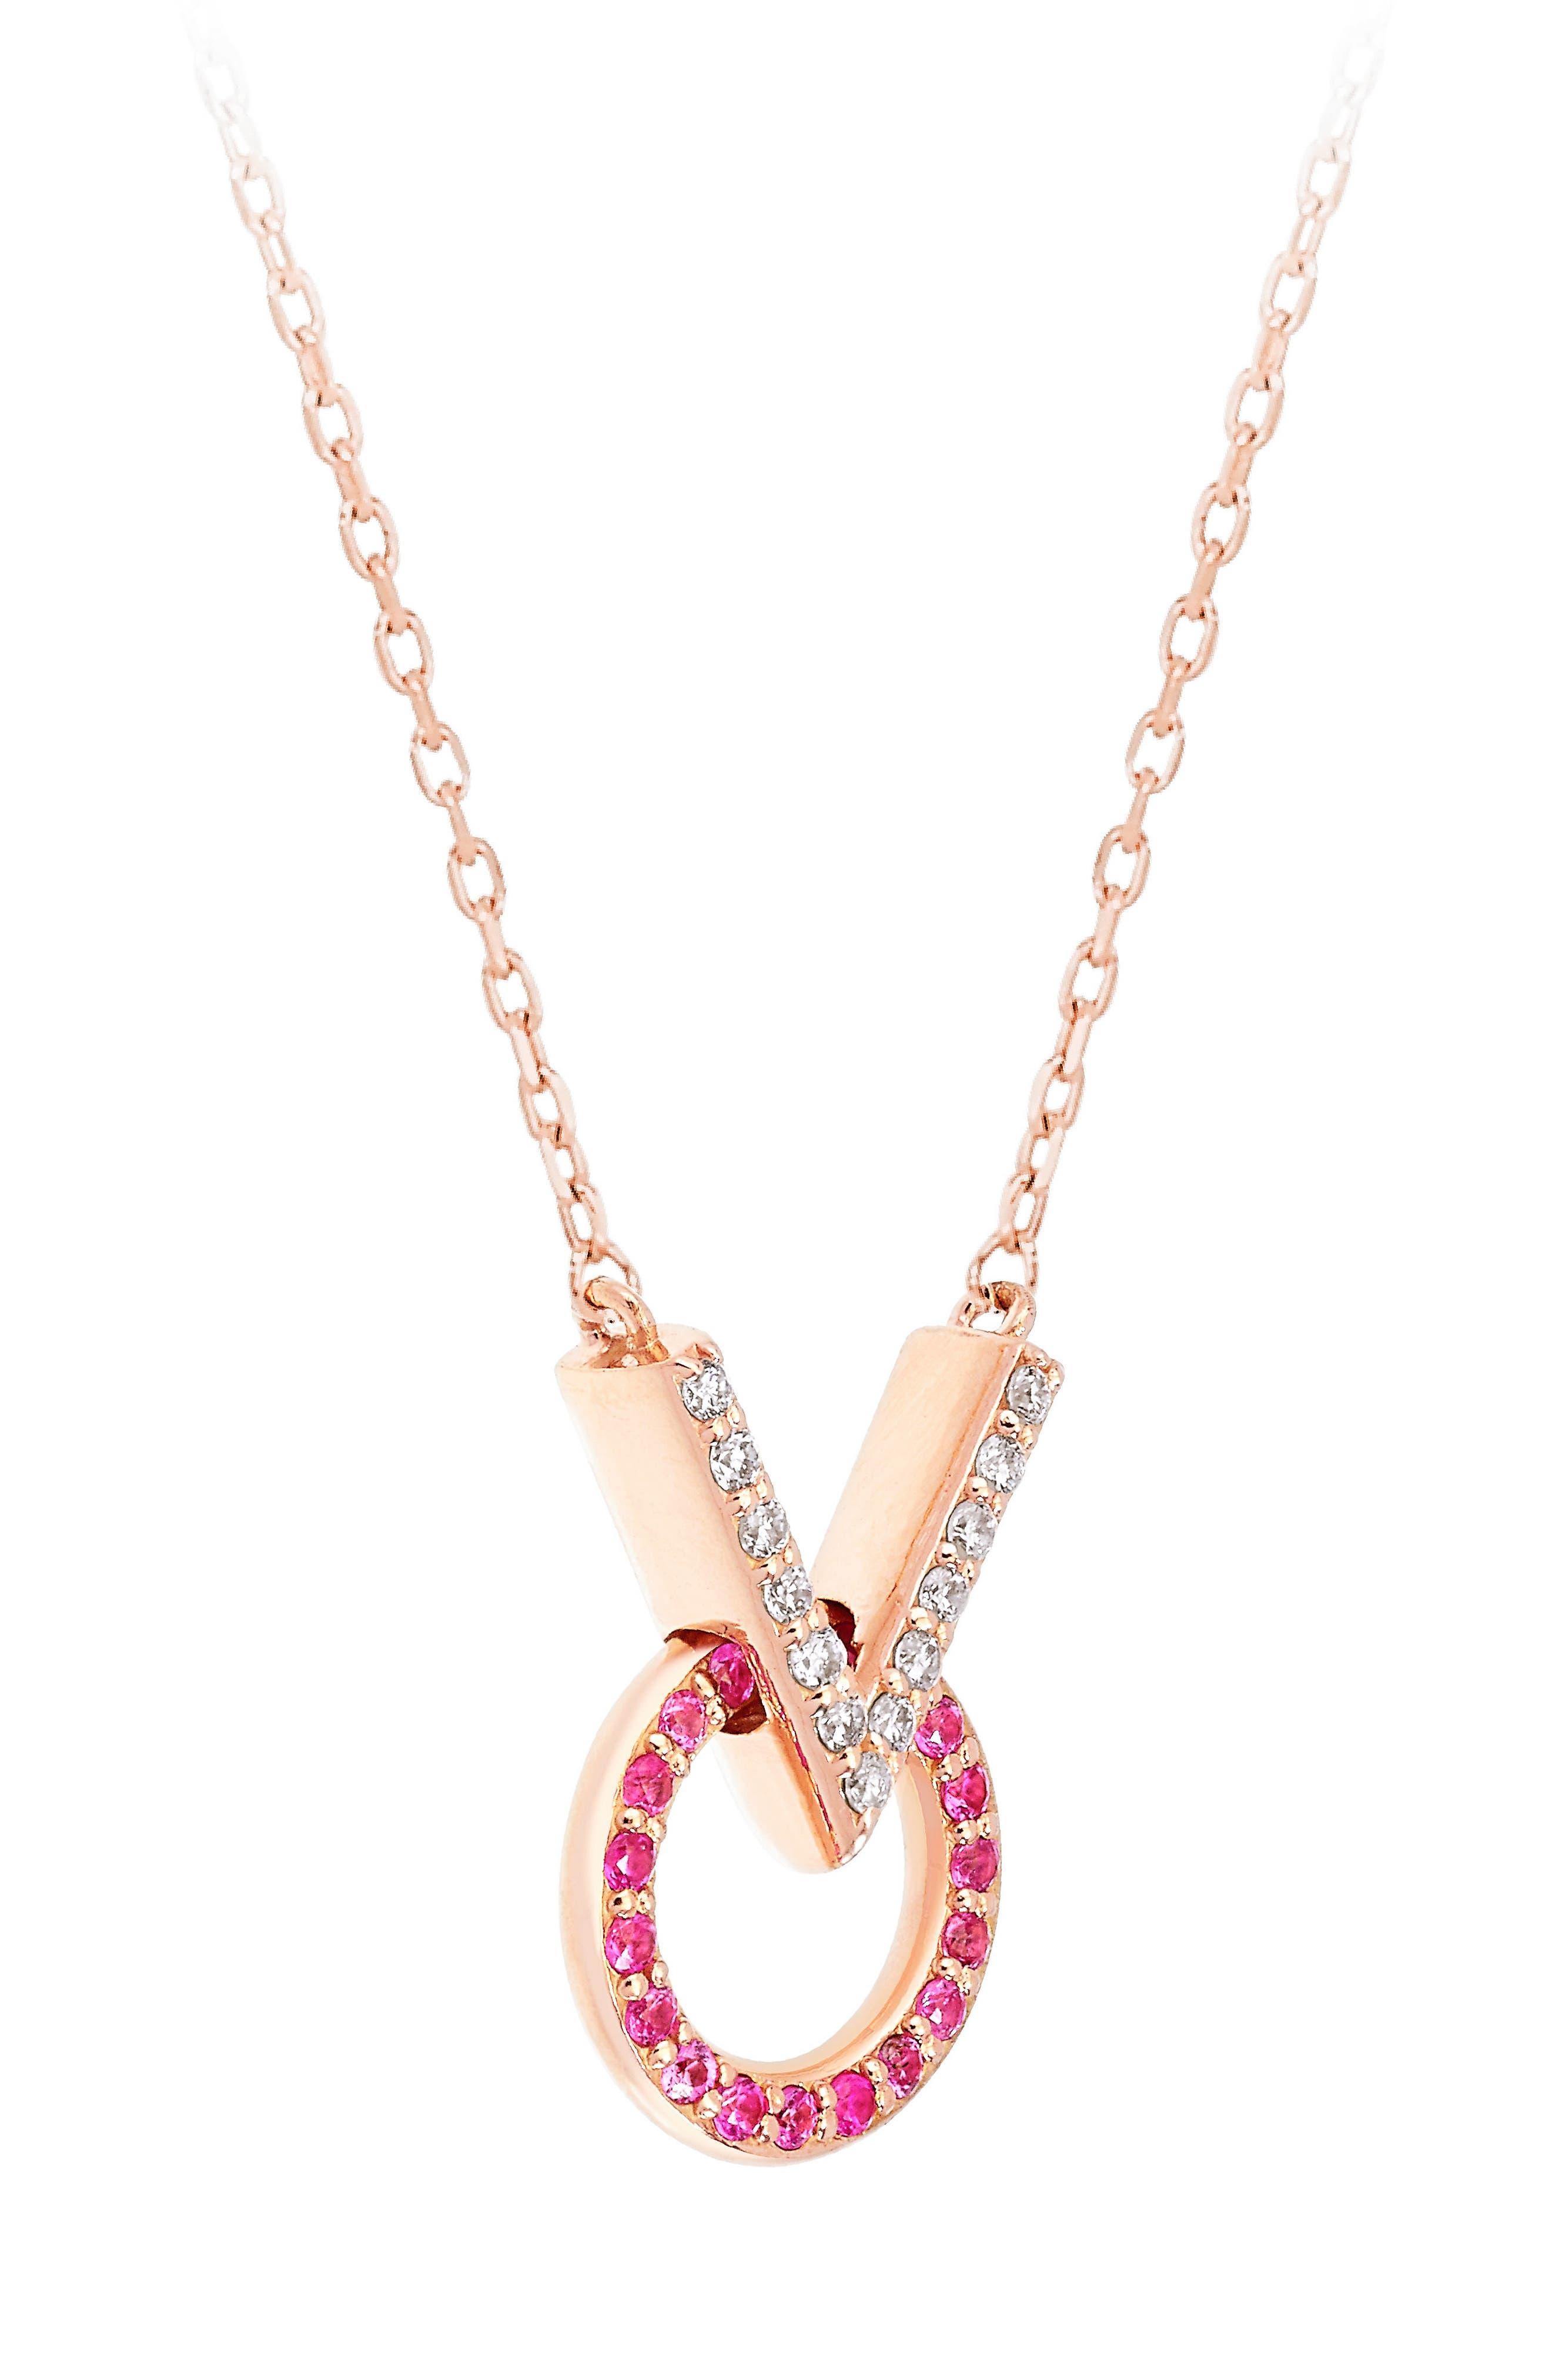 Baby Memphis V Round Diamond & Pink Sapphire Necklace,                             Alternate thumbnail 2, color,                             710